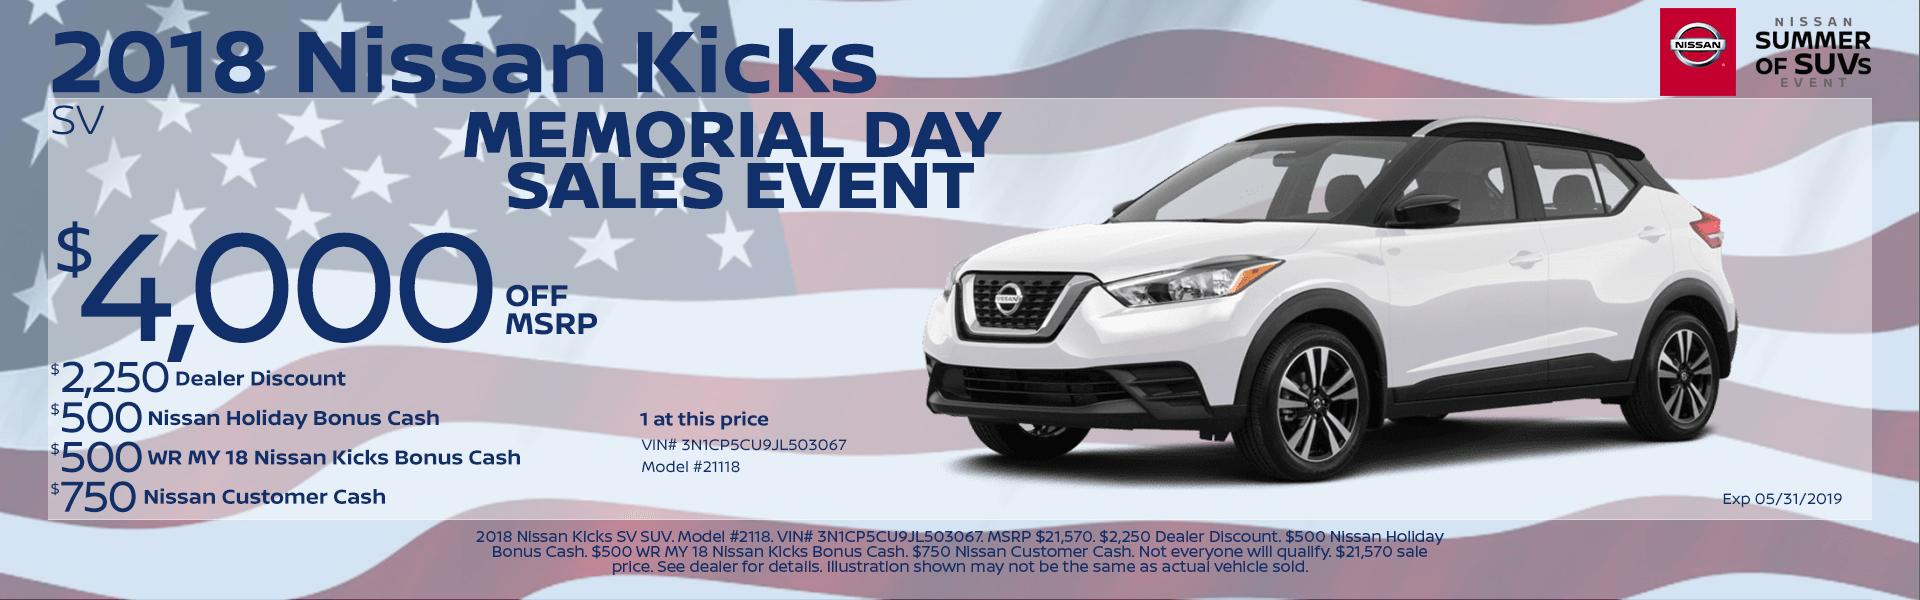 2018 Nissan Kicks Special